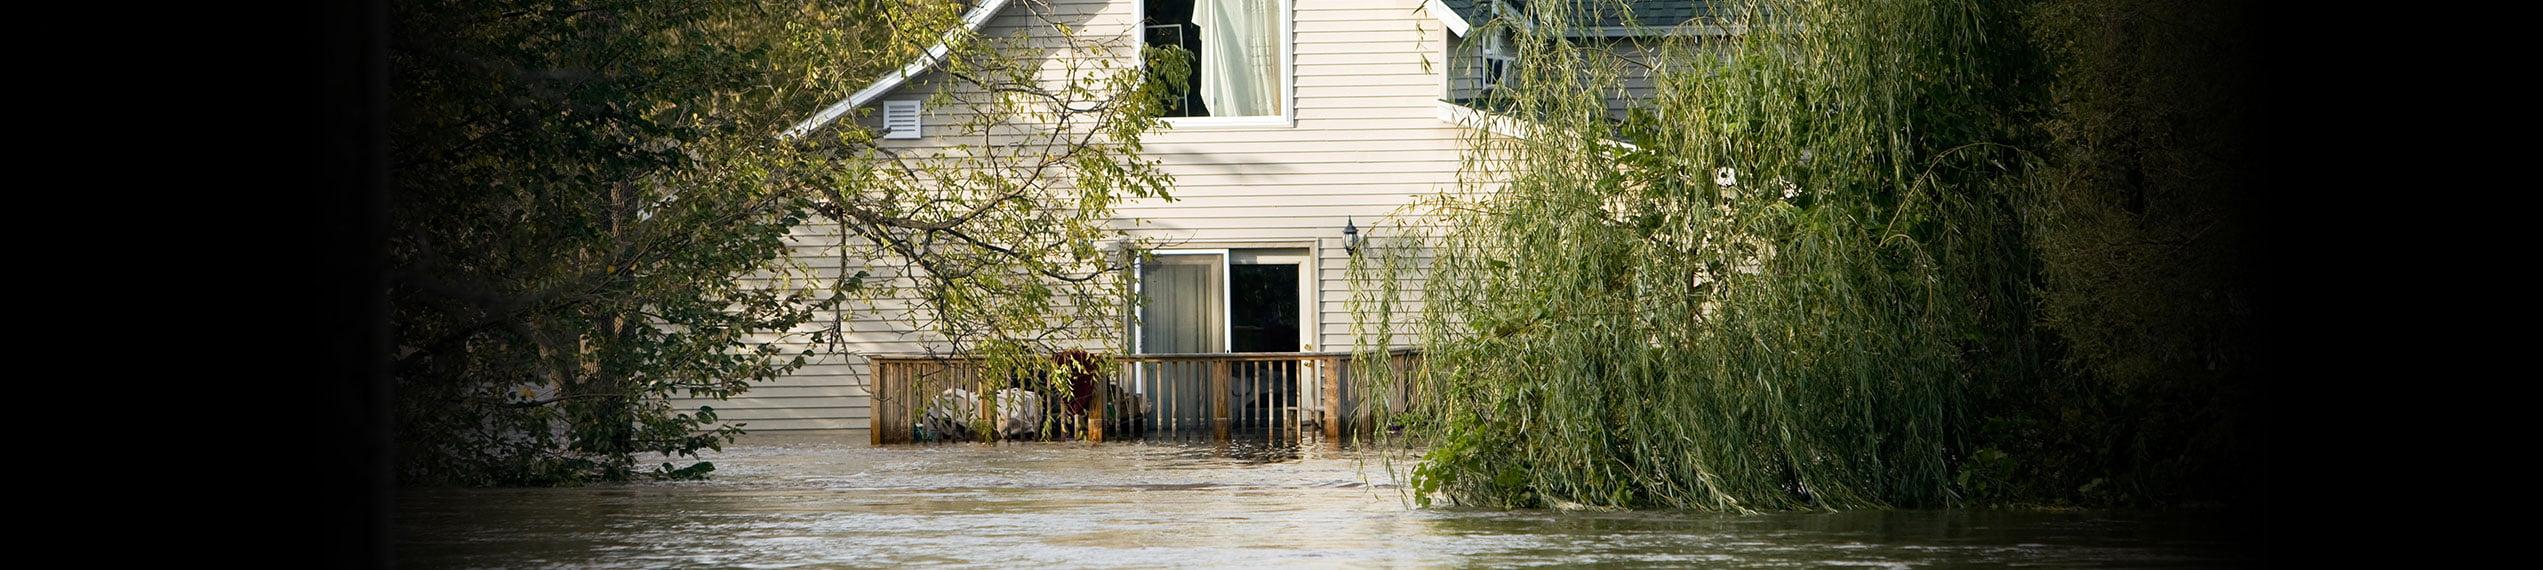 Water & Flood Damage Removal Services in Paul Davis Emergency Services of West Huntsville AL